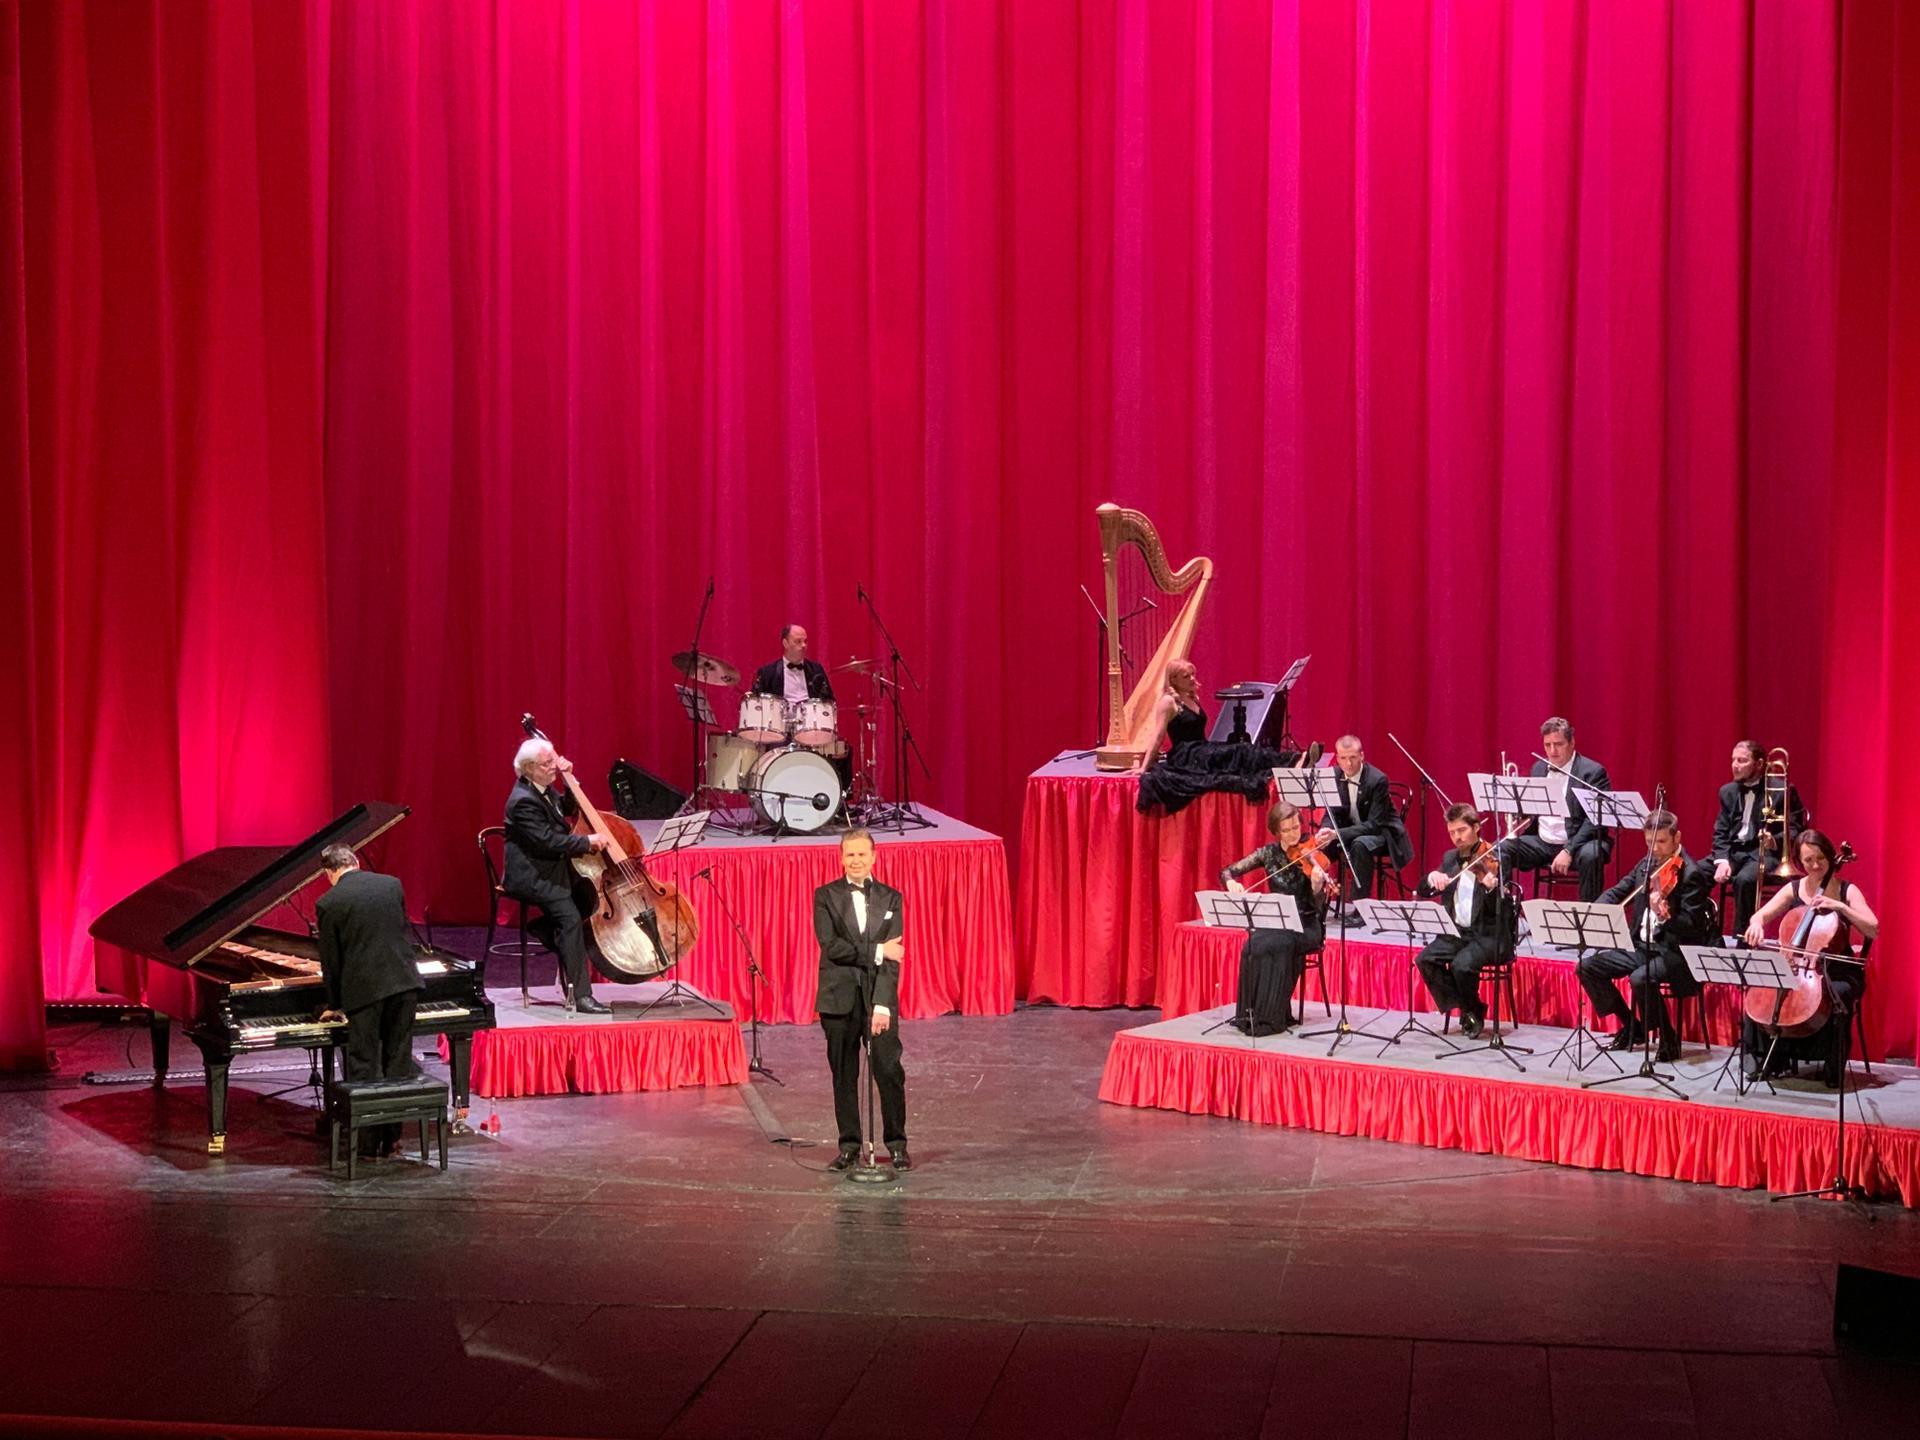 Ragnar Kjartansson performed God at the Mayakovsky Theatre in Moscow last night © The Art Newspaper/Gareth Harris